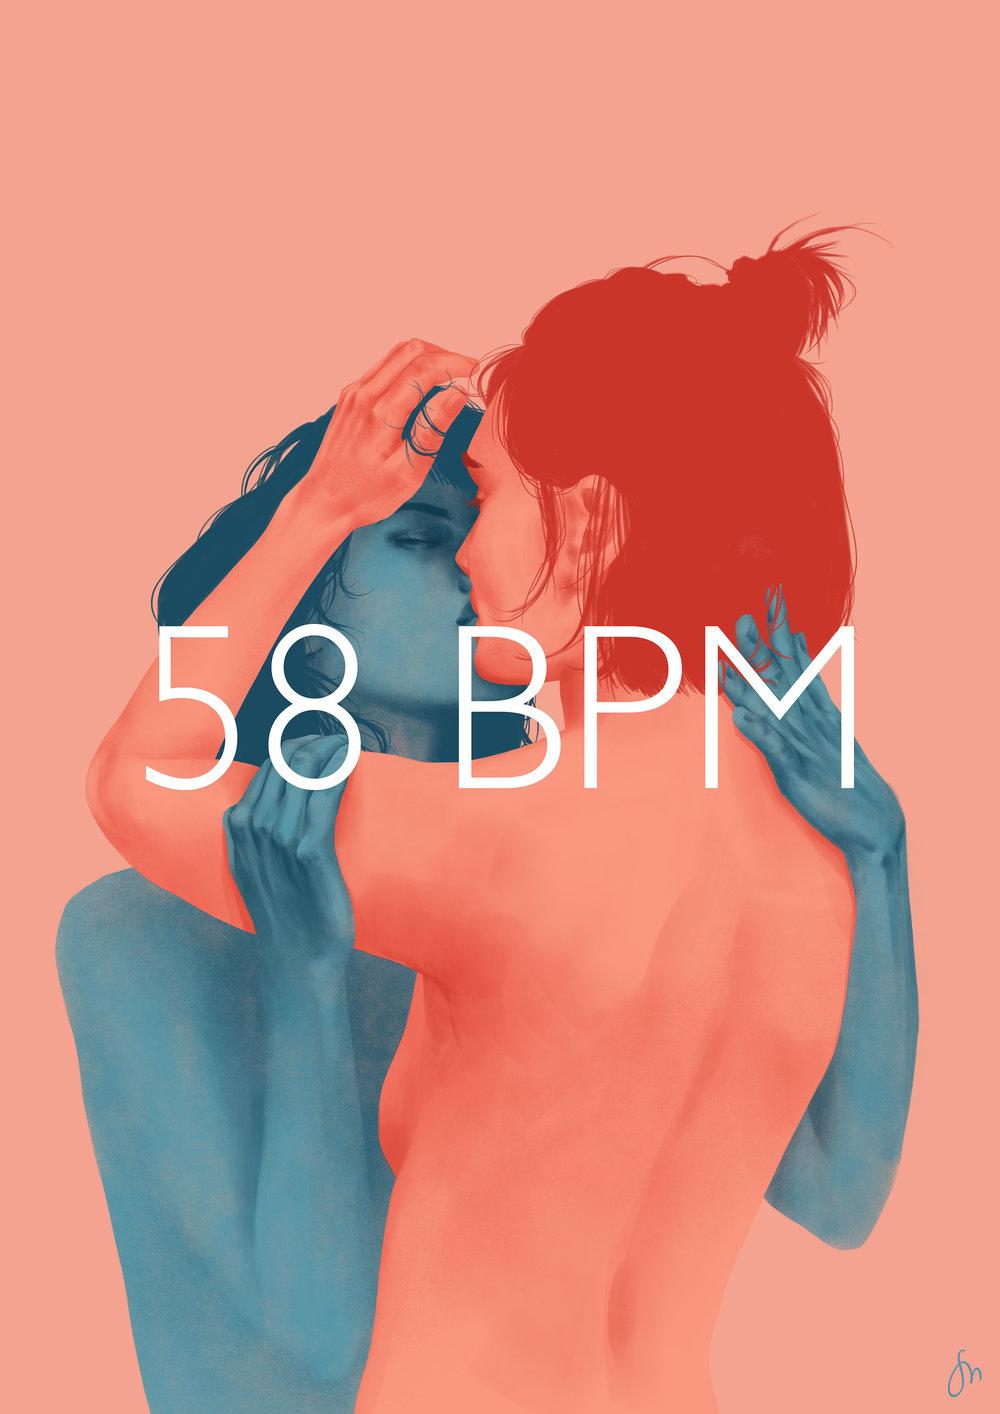 58 BPM.jpg